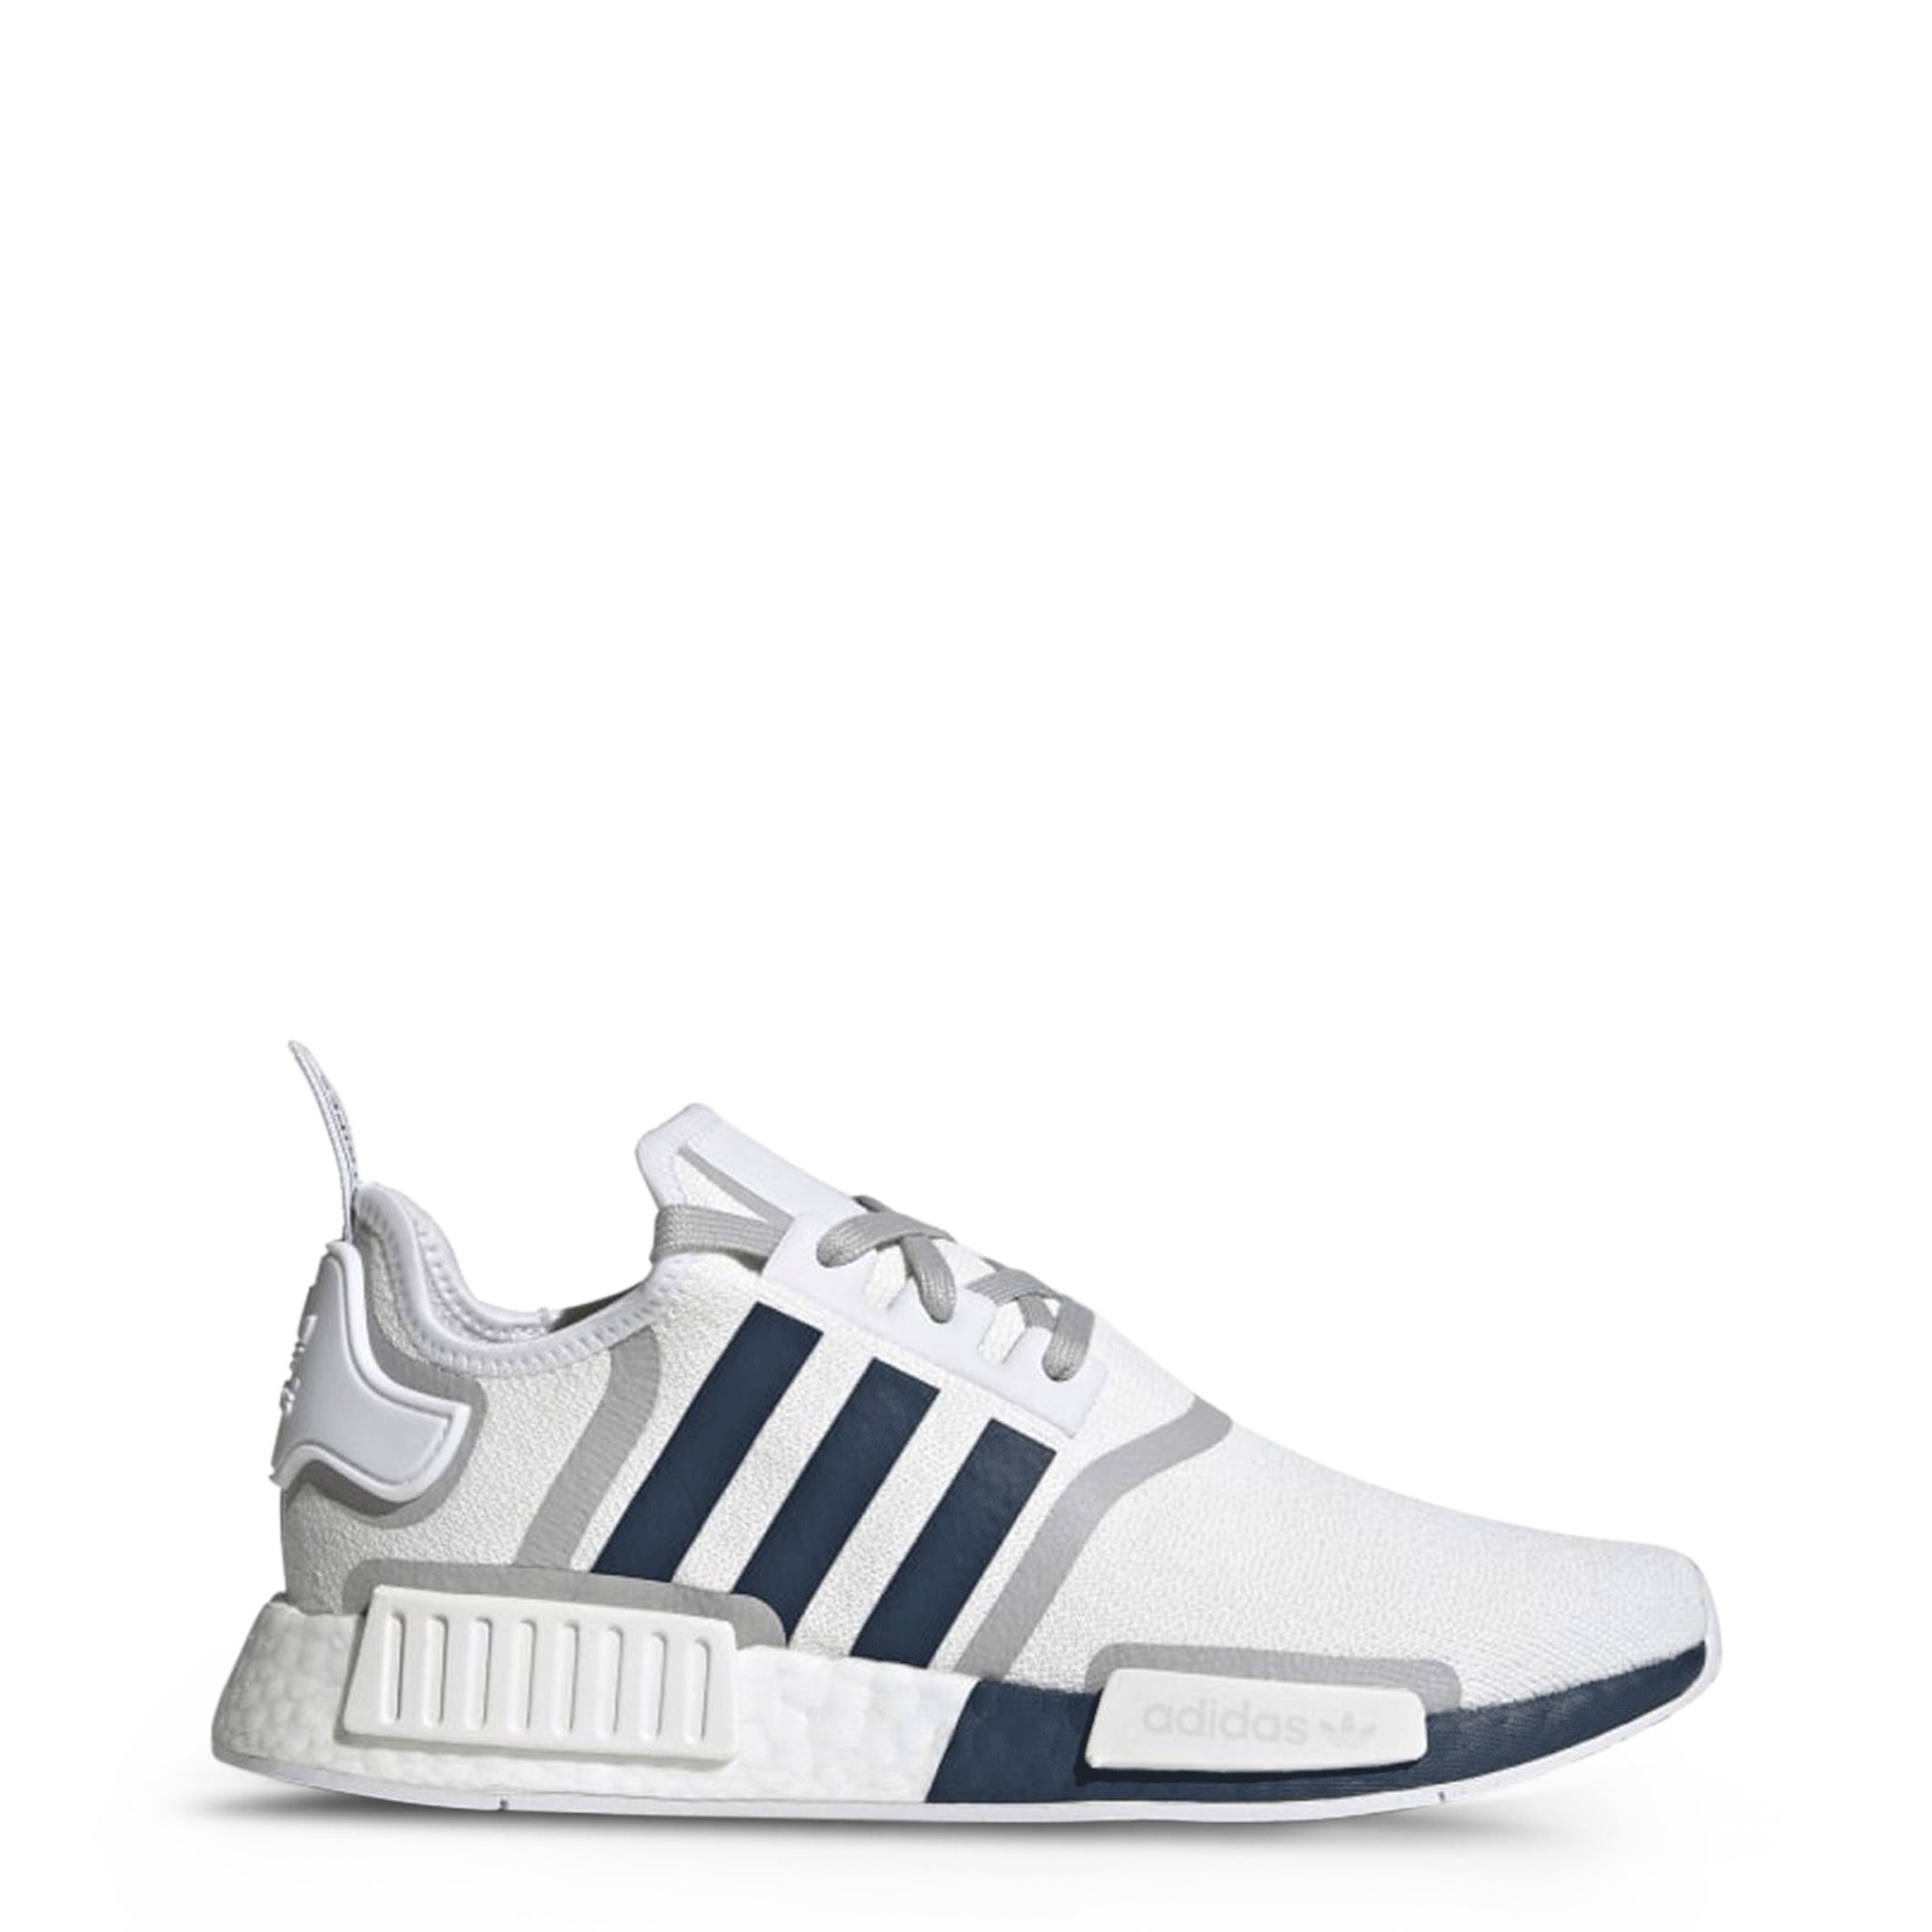 Adidas - NMD_R1 - White